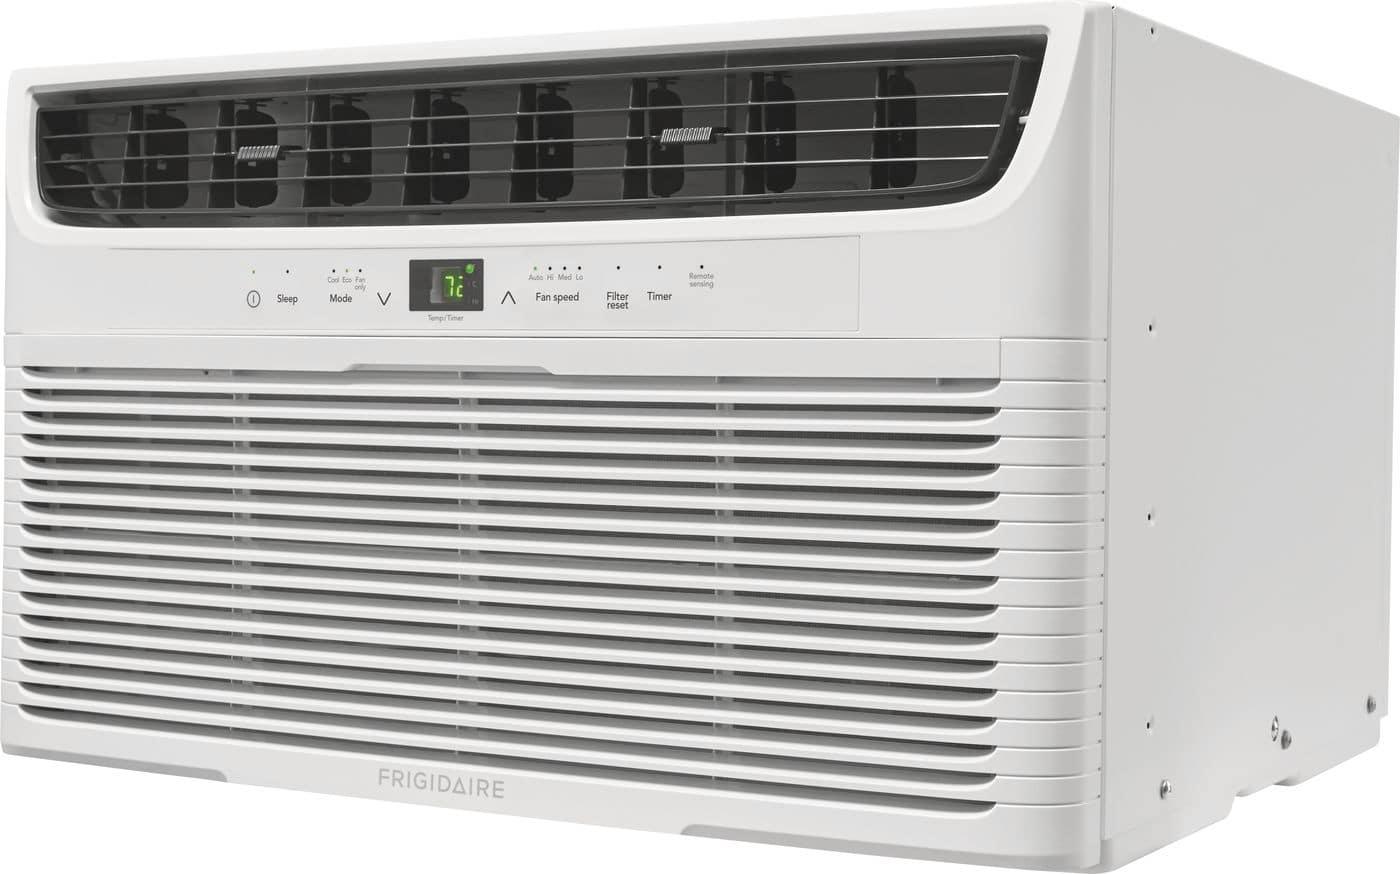 Model: FFTA1422U2 | Frigidaire 14,000 BTU Built-In Room Air Conditioner- 230V/60Hz